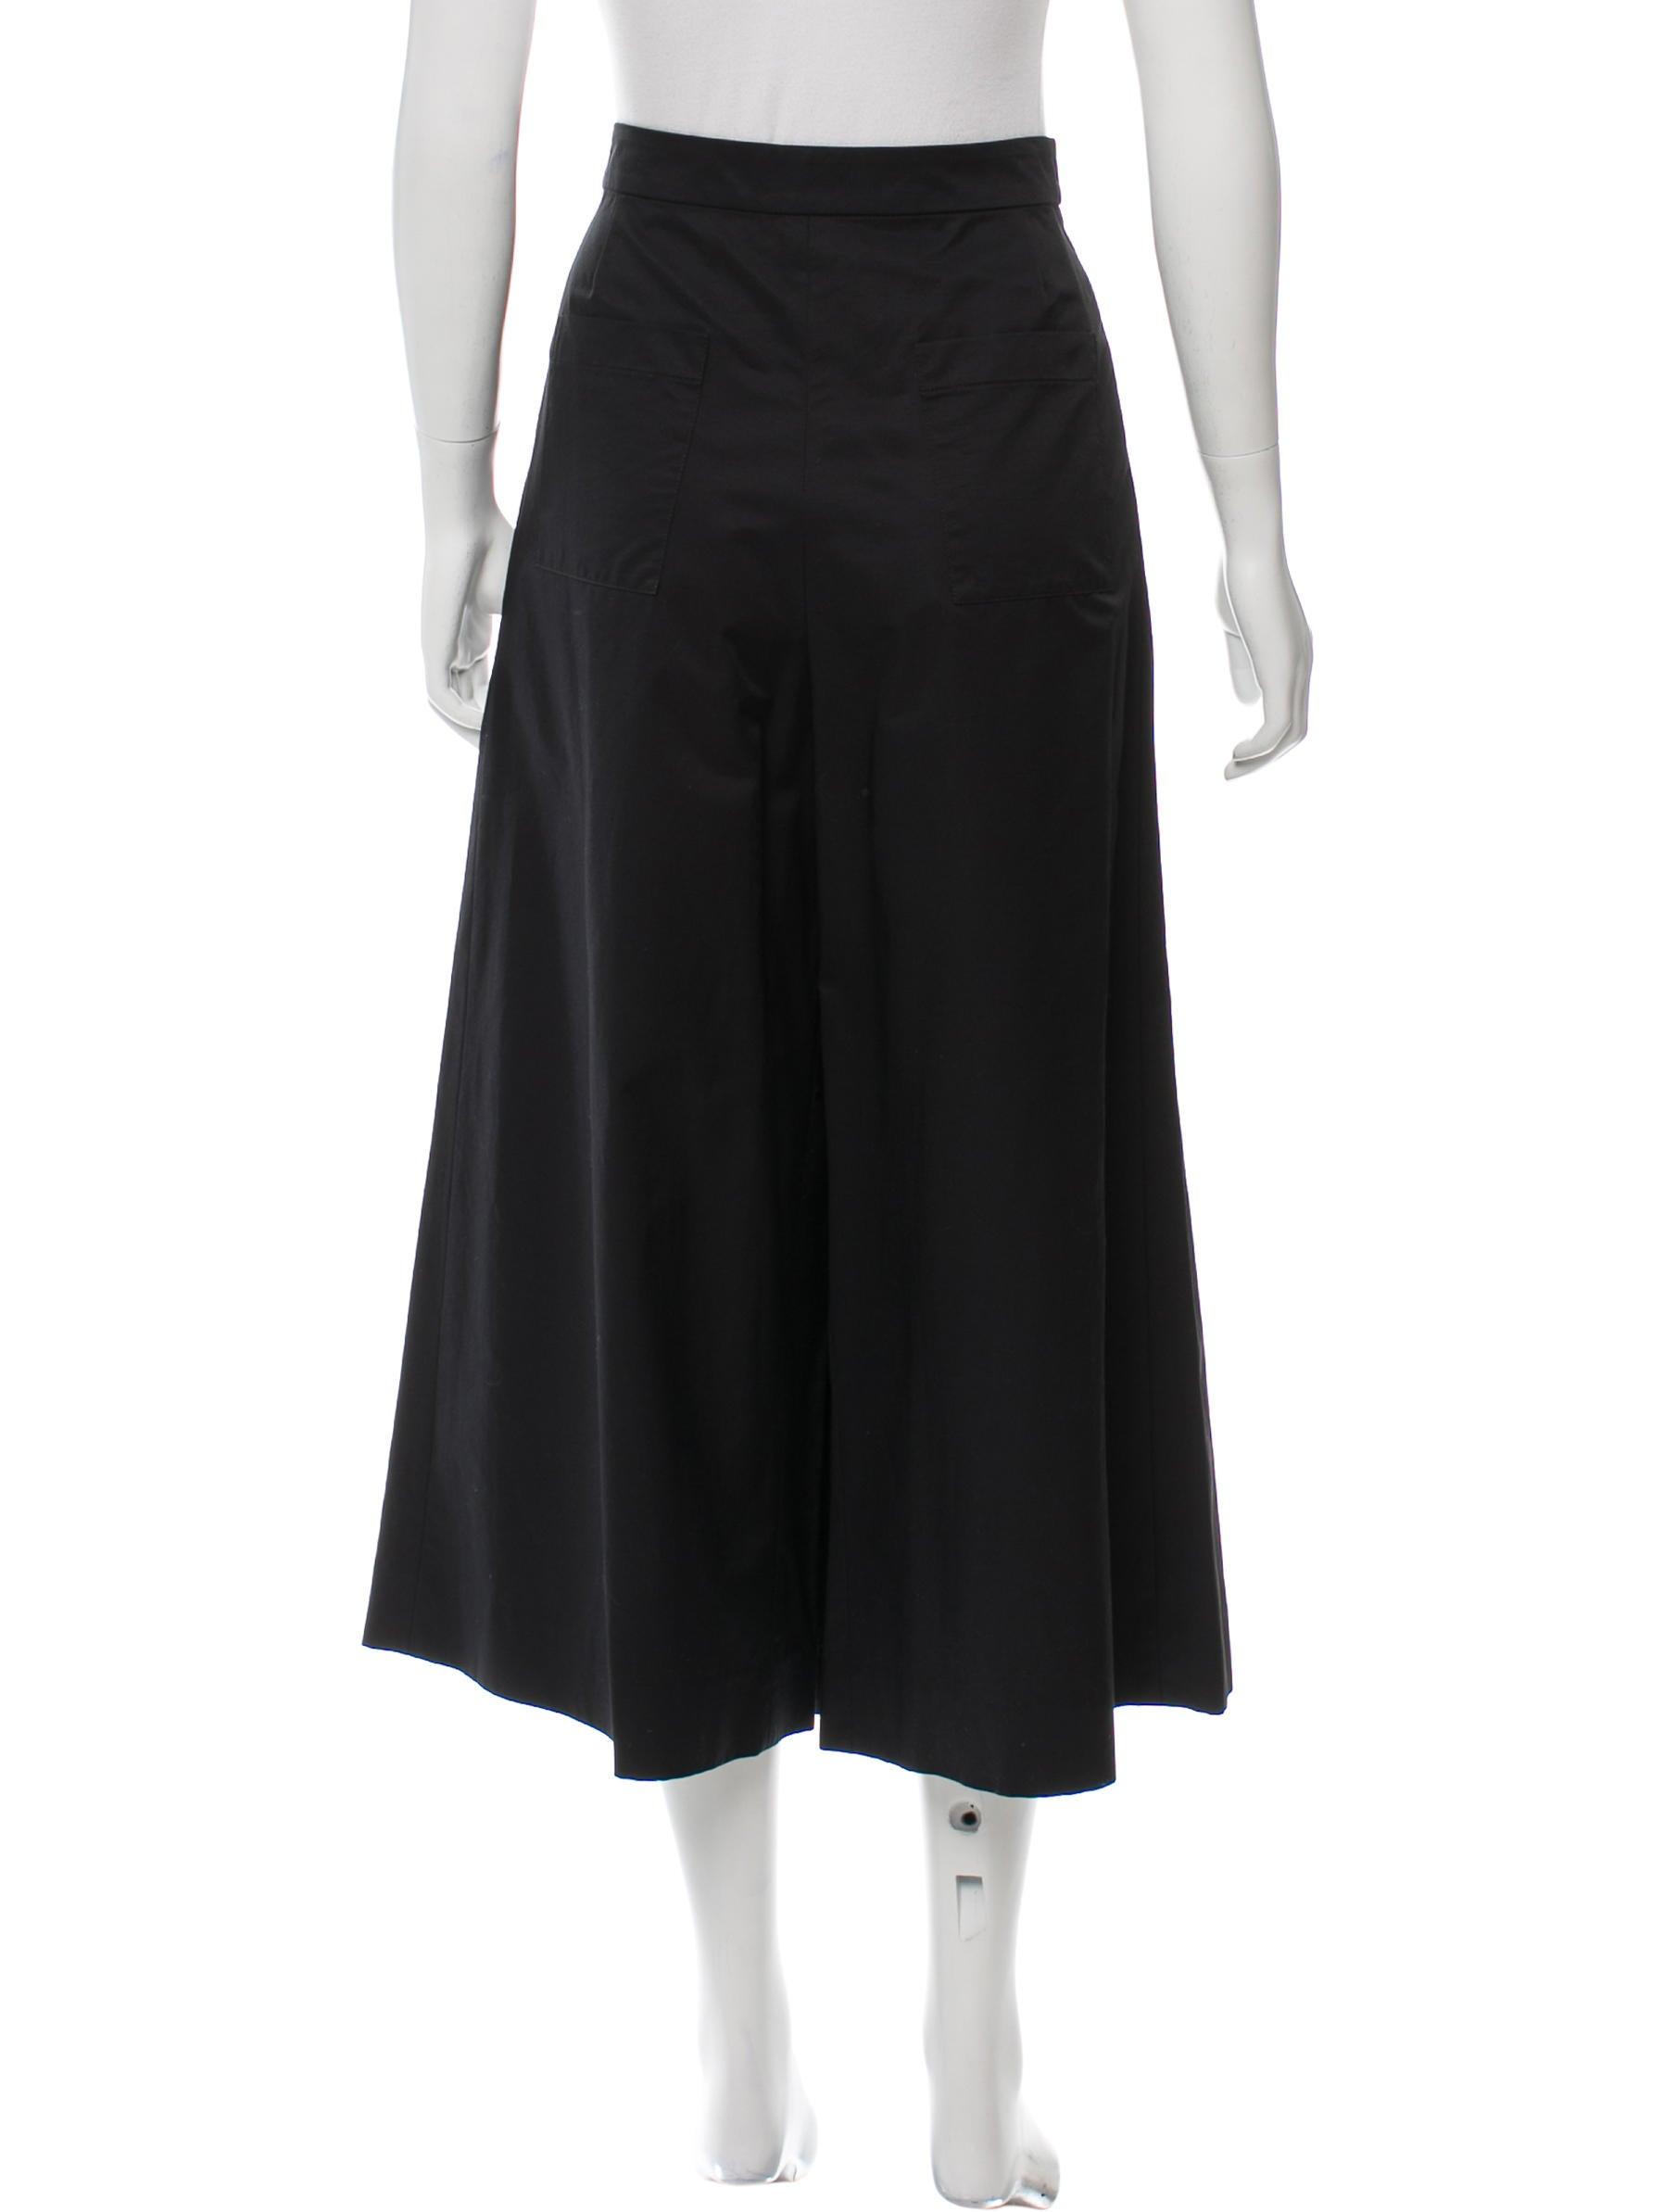 Wonderful Stella McCartney Pleated WideLeg Pants  Clothing  STL47667  The